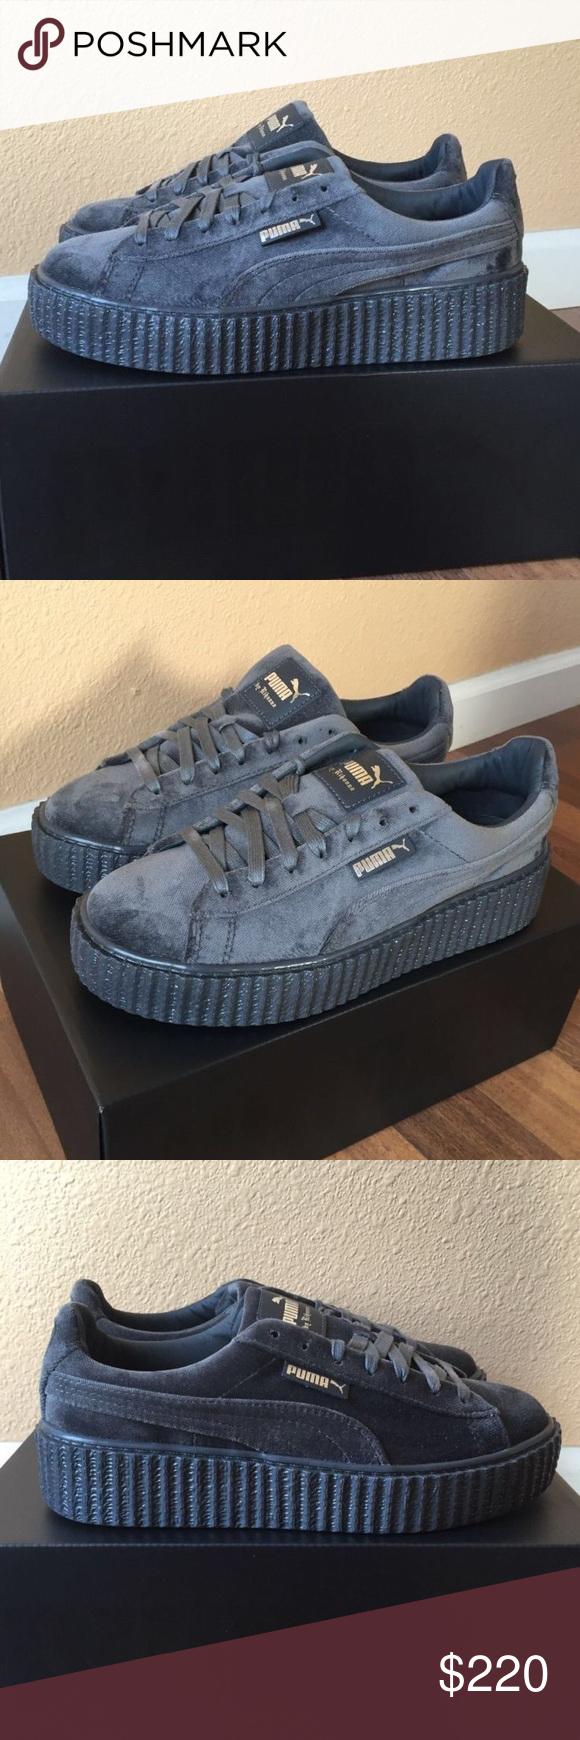 PUMA X RIHANNA Velvet CREEPERS FENTY Grey ✨ PUMA X RIHANNA Velvet CREEPERS FENTY Glacier Grey  // New with tags ✨// Women's size 8 // Puma Shoes Sneakers